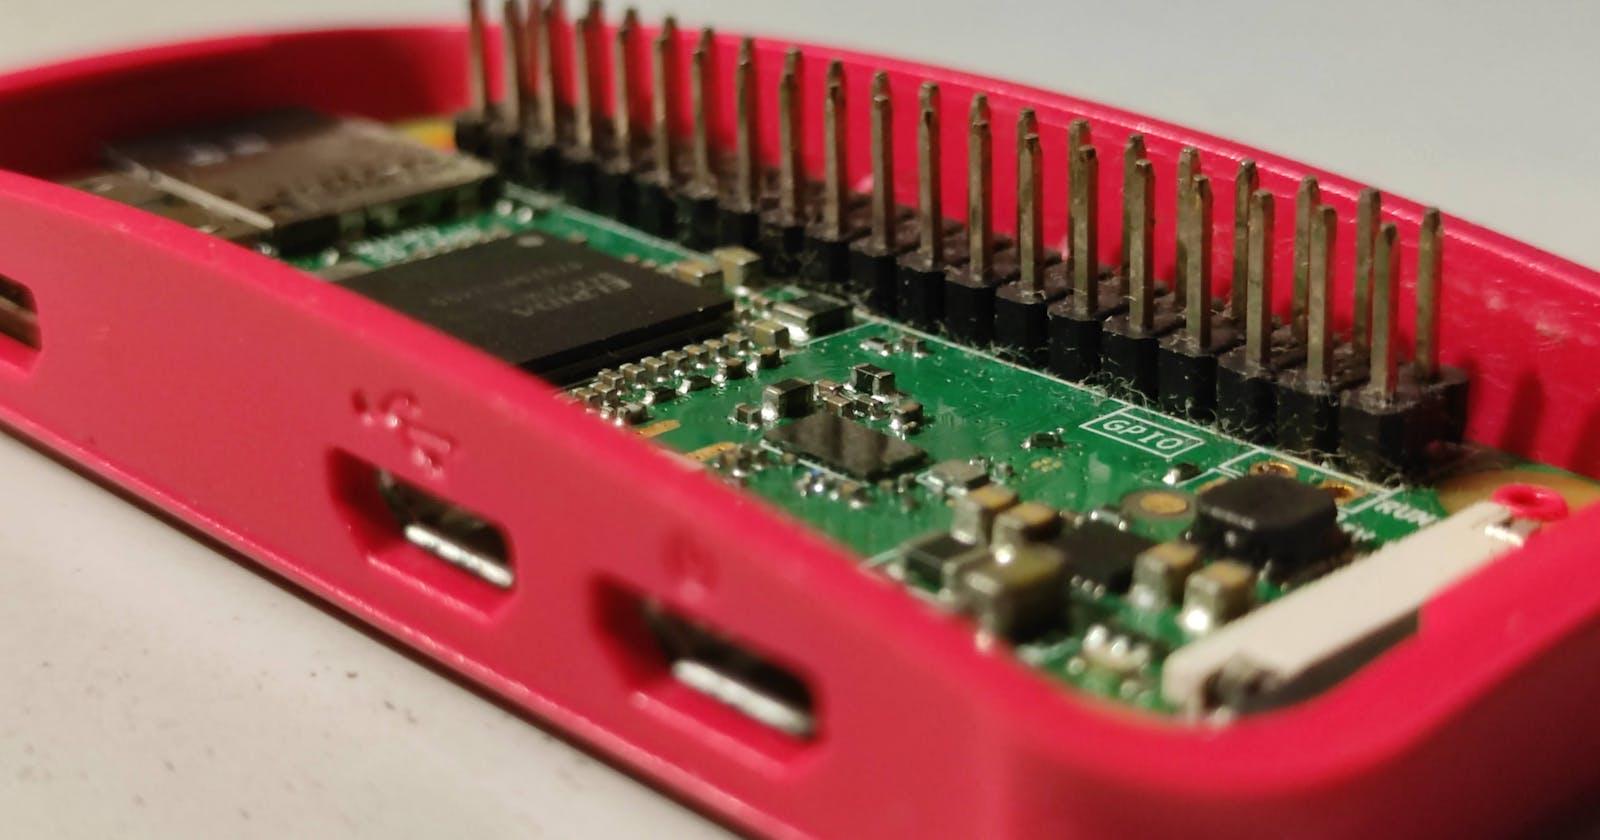 Setting up Raspberry pi to run a web server